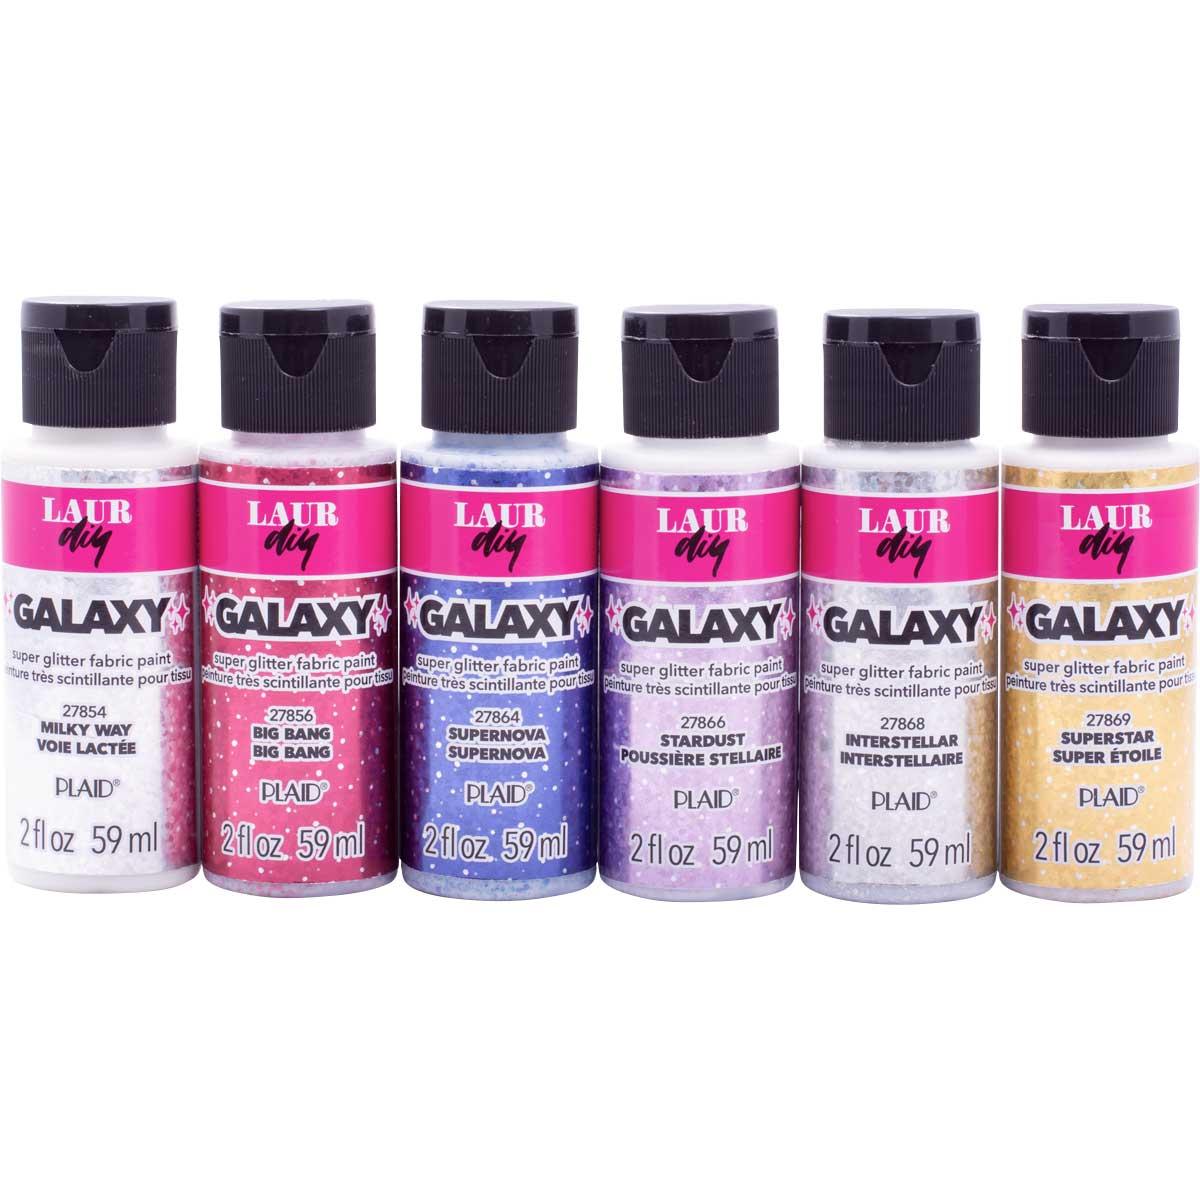 LaurDIY ® Galaxy Glitter Fabric Paint Set